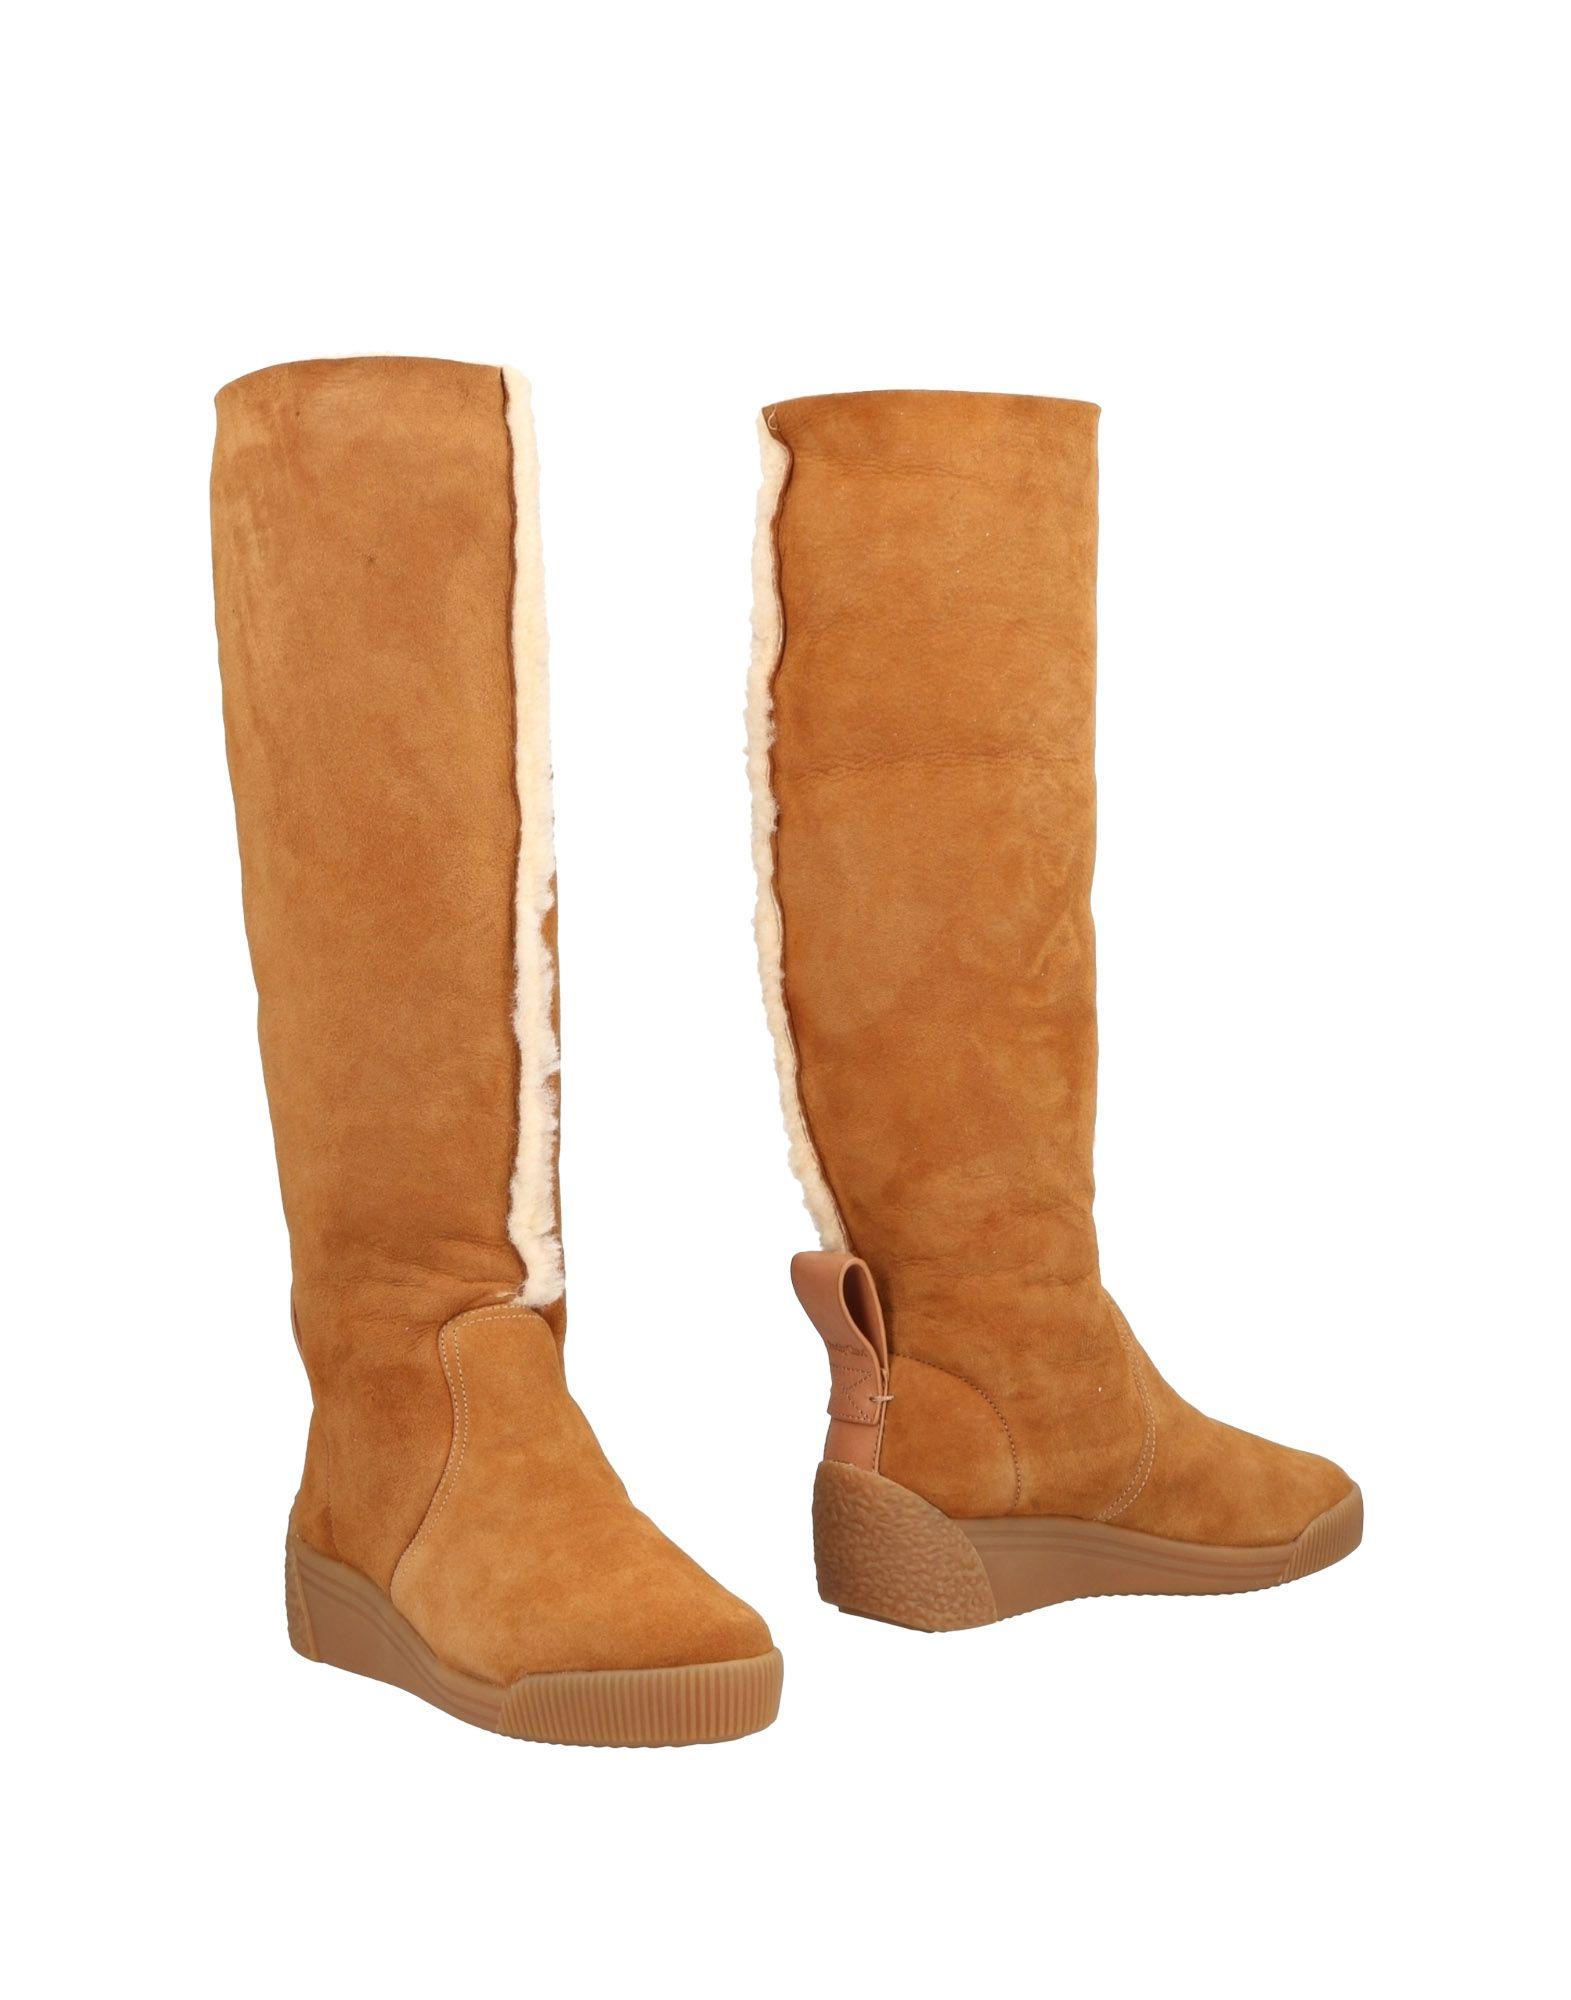 Rabatt Schuhe See By Chloé Stiefel Damen  11483362UR